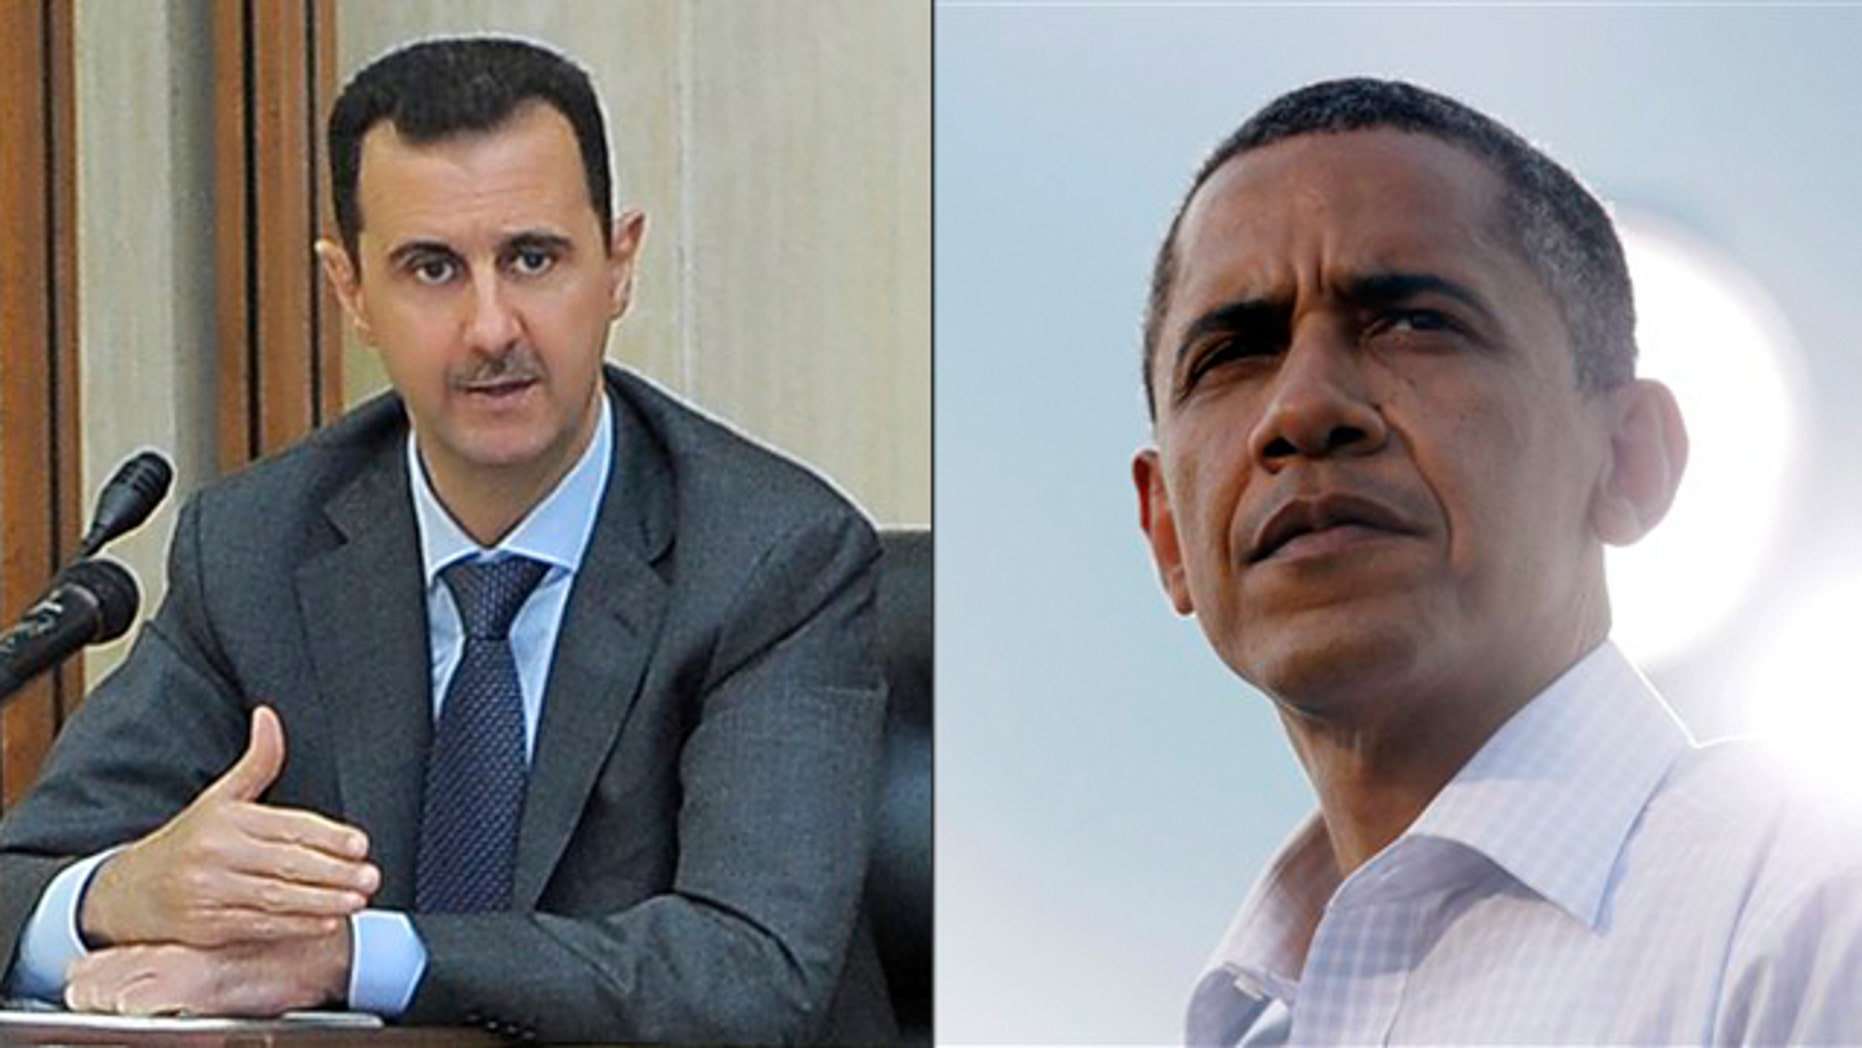 Shown here are Syrian President Bashar Assad and President Obama.